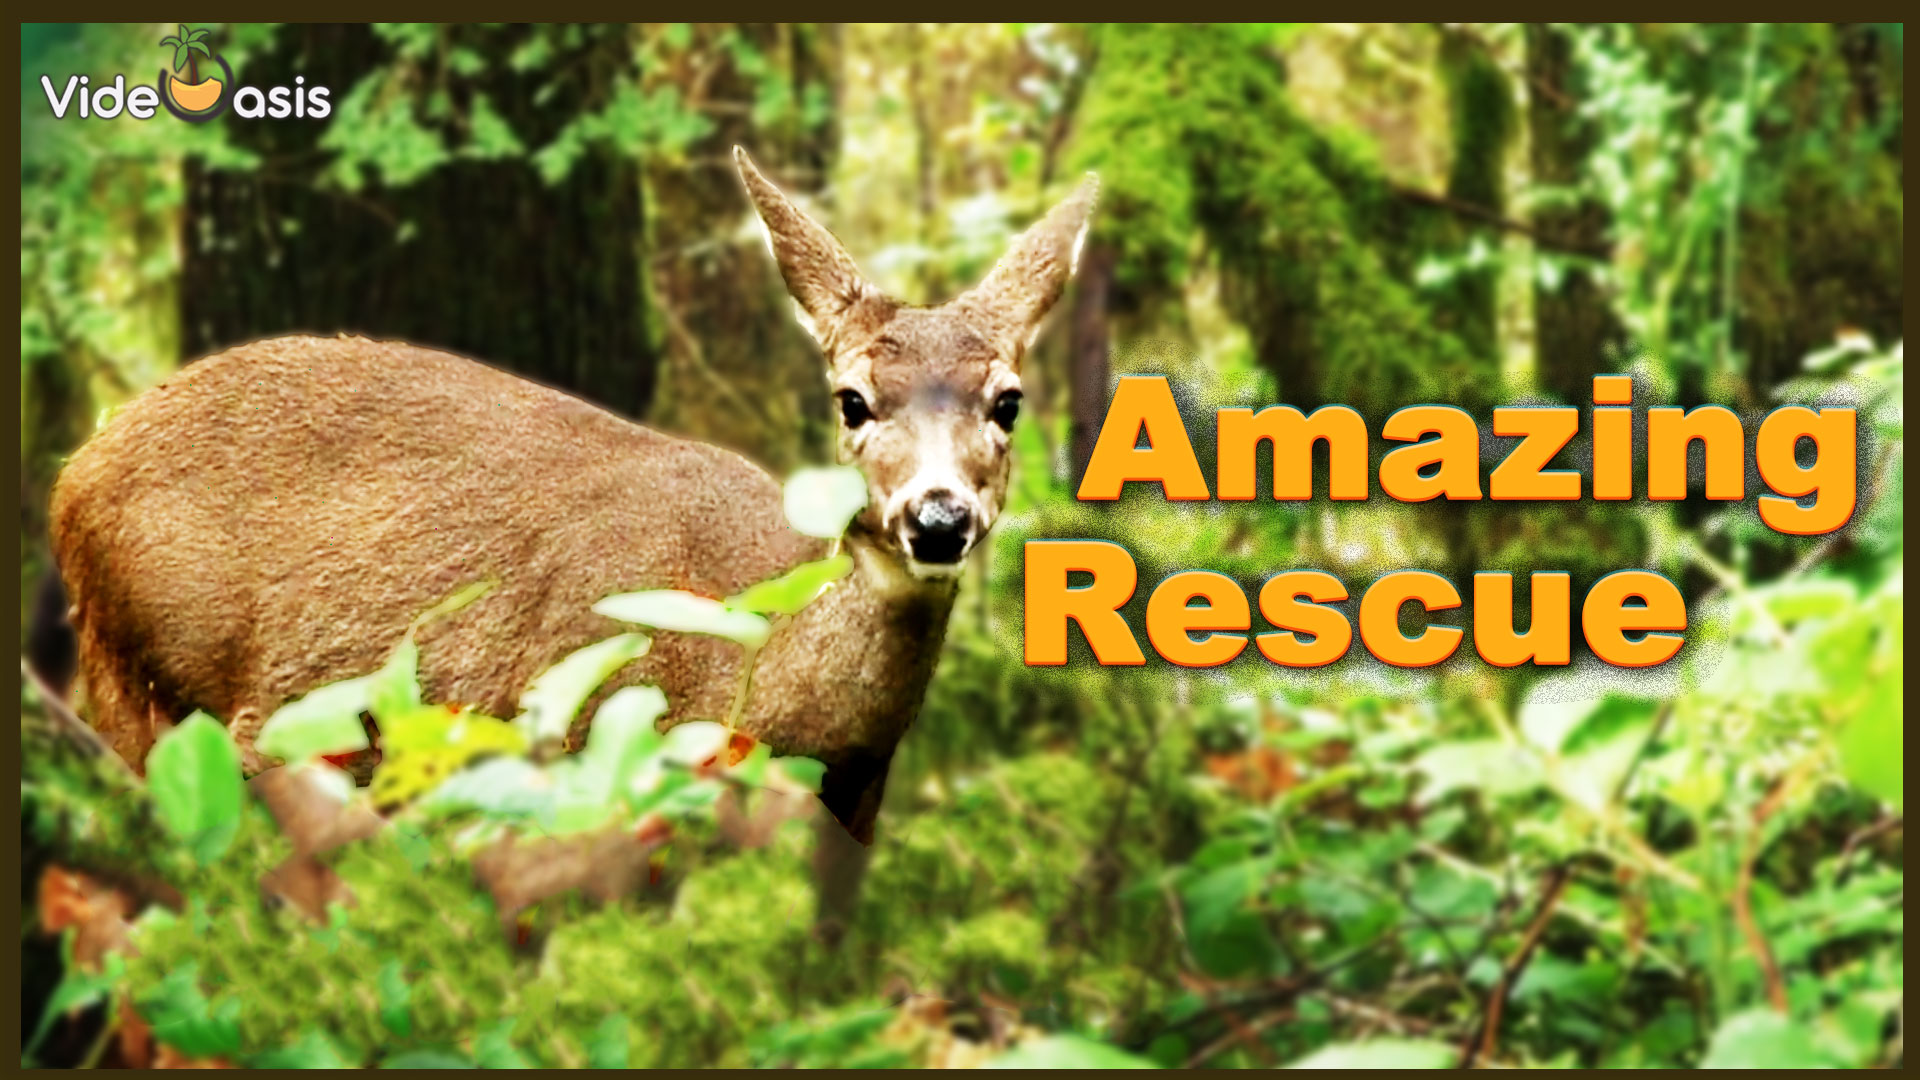 VideOasis Amazing-Rescue-I |VideOasis